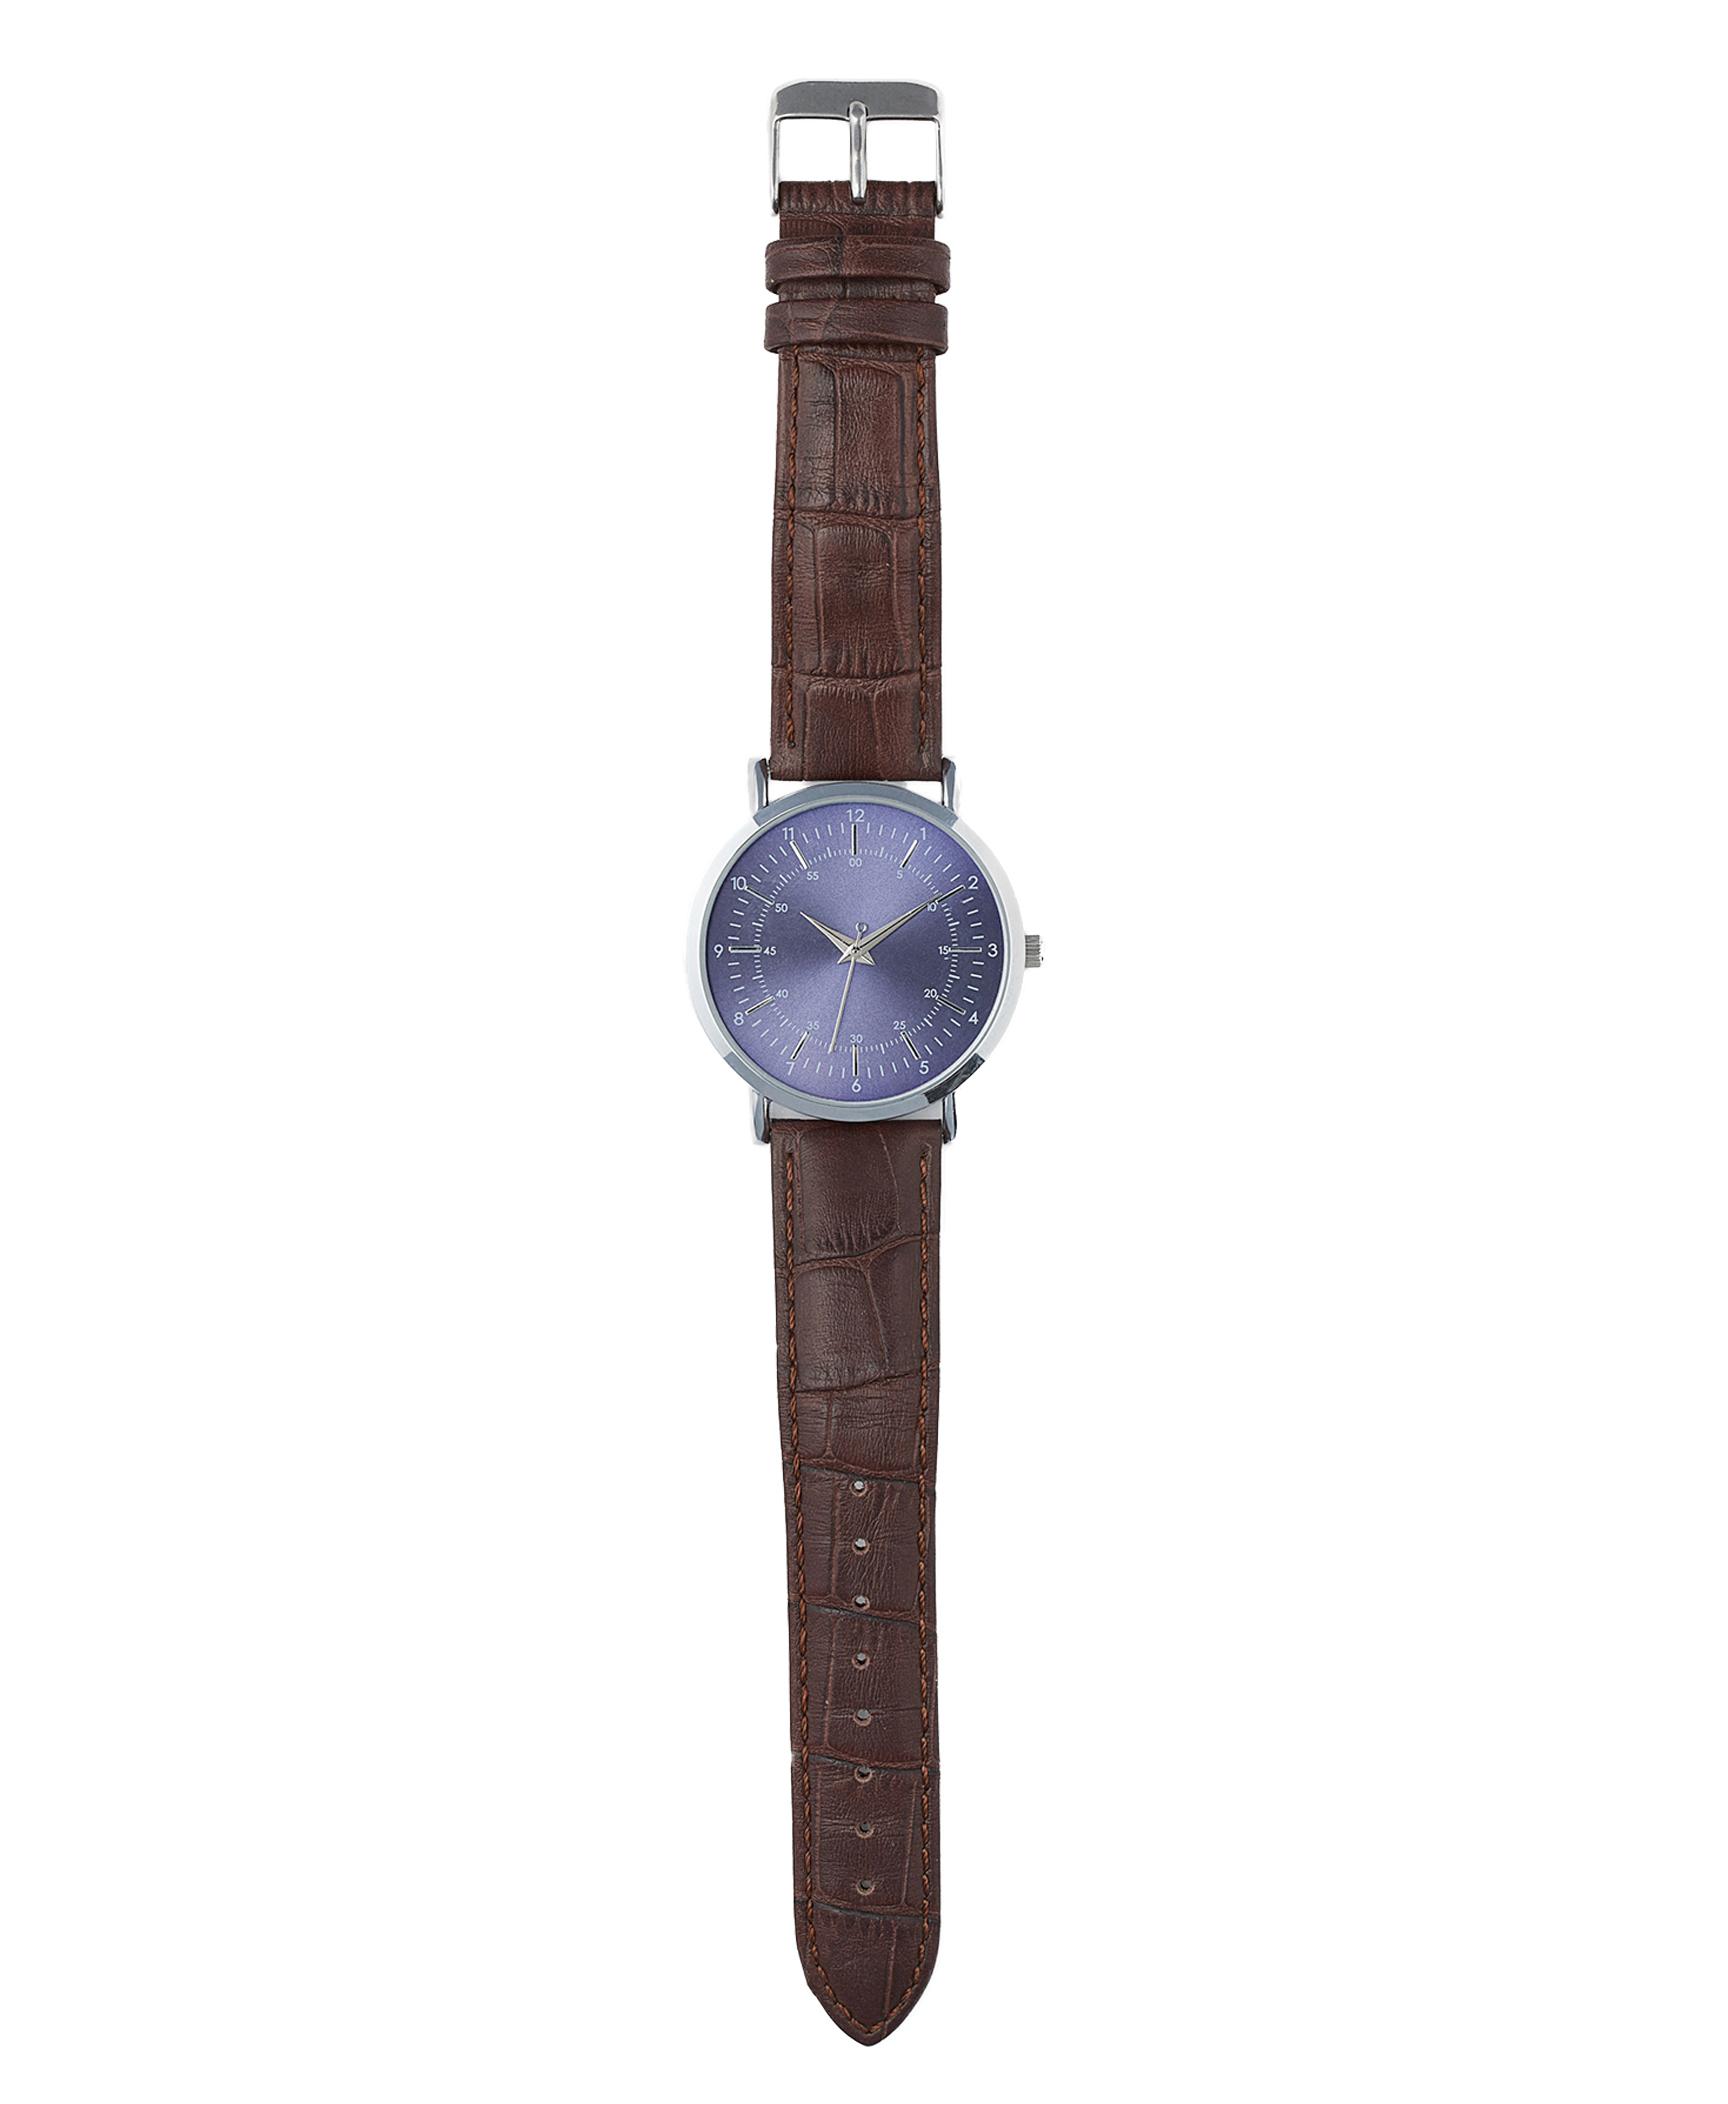 H&M wristwatch